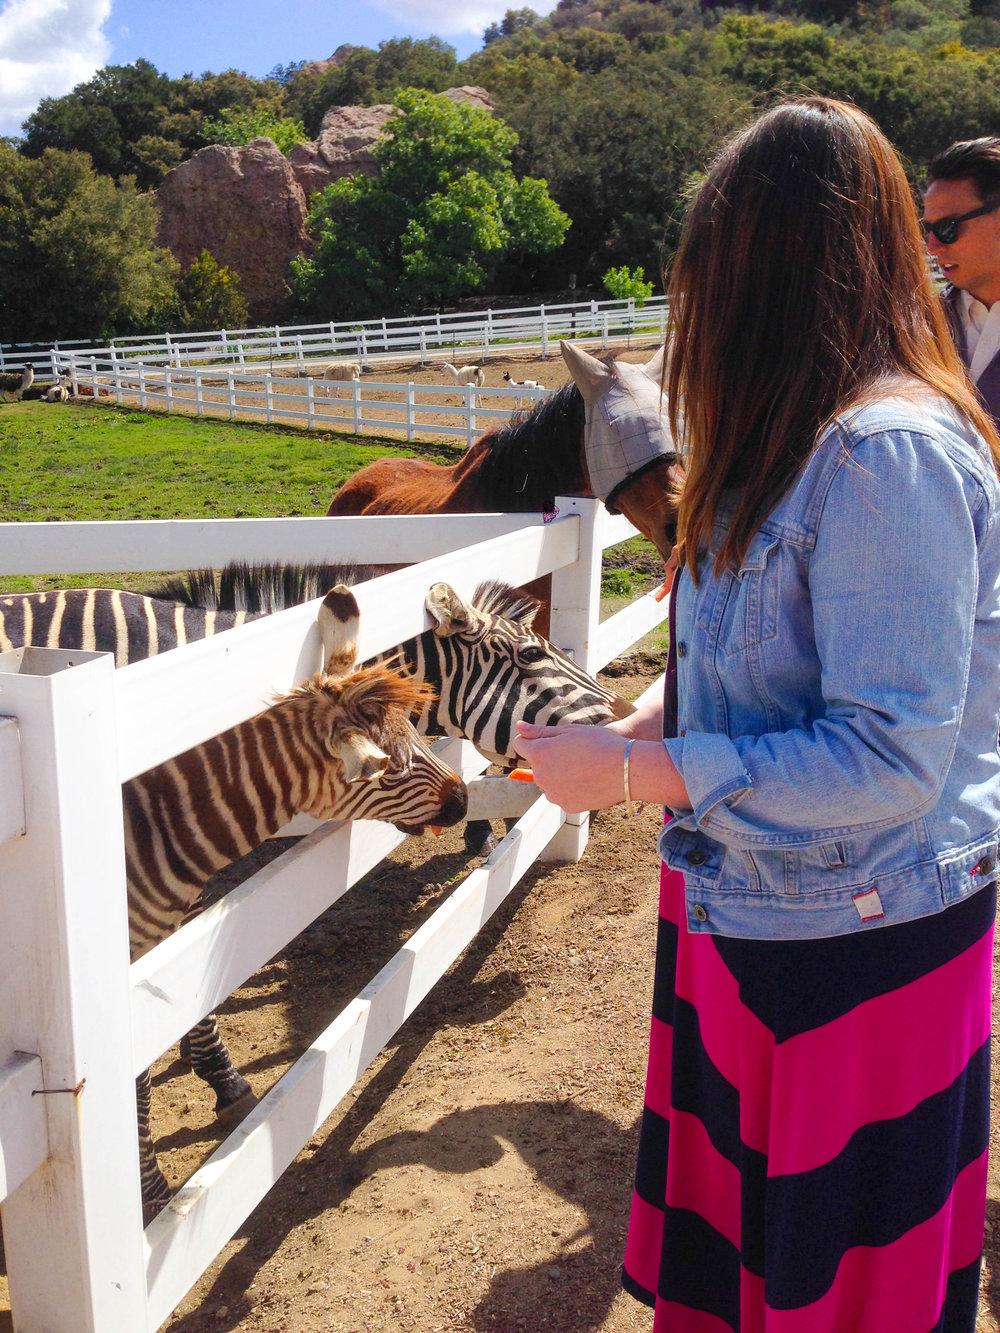 Malibu Wine Safari - Feeding the Zebras